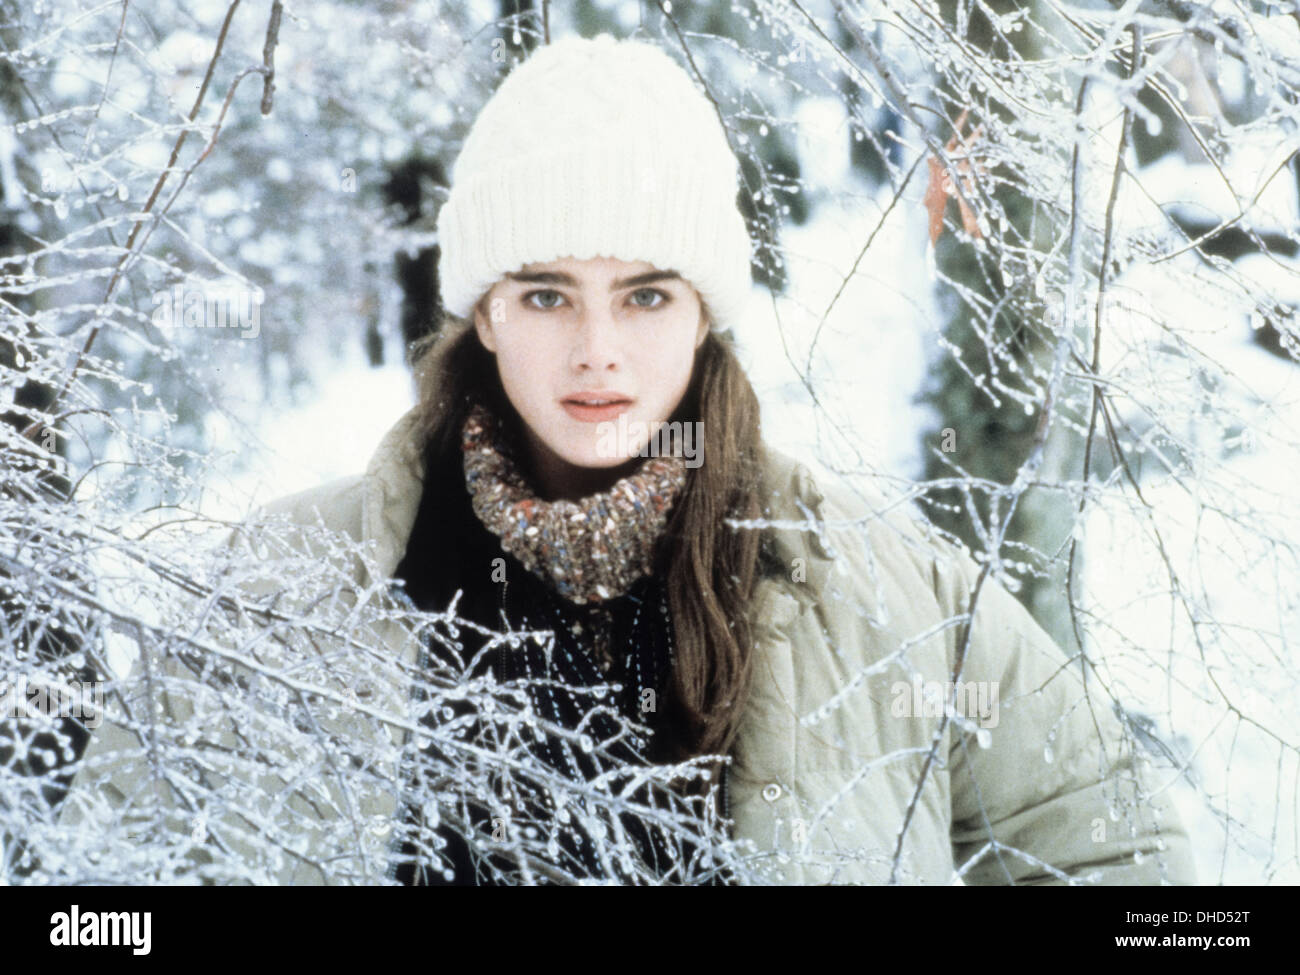 Endless Love 1981 Brooke Shields Imagenes De Stock Endless Love